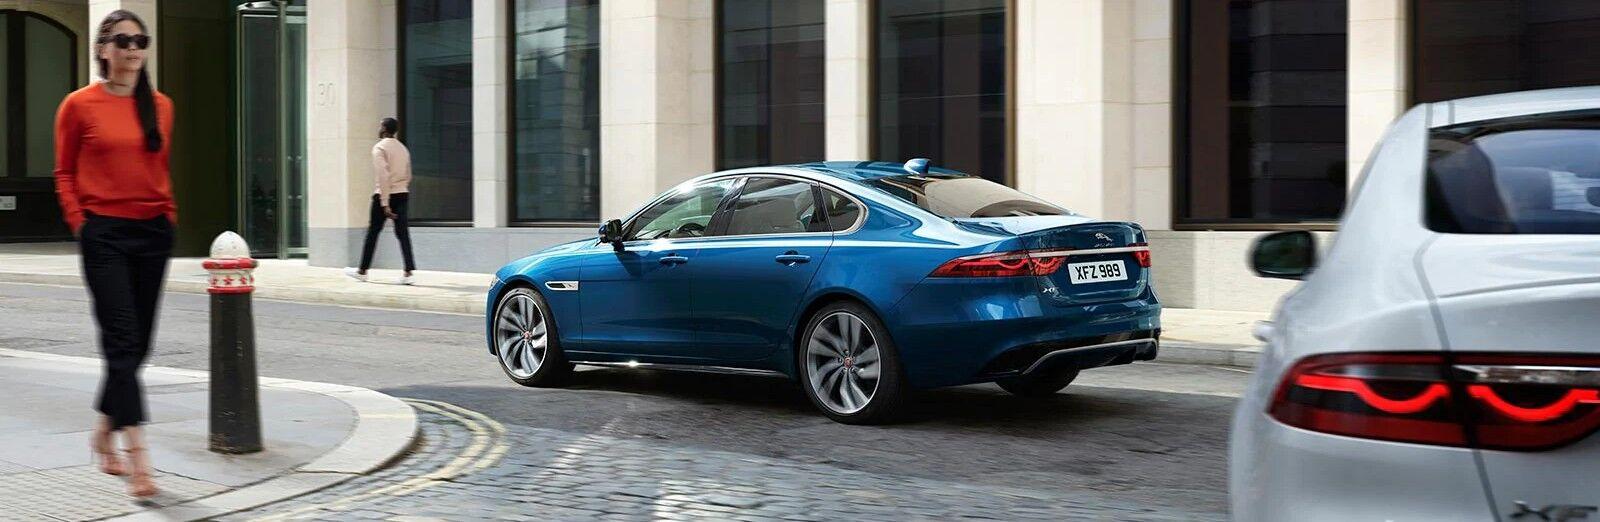 Blue 2021 Jaguar XF